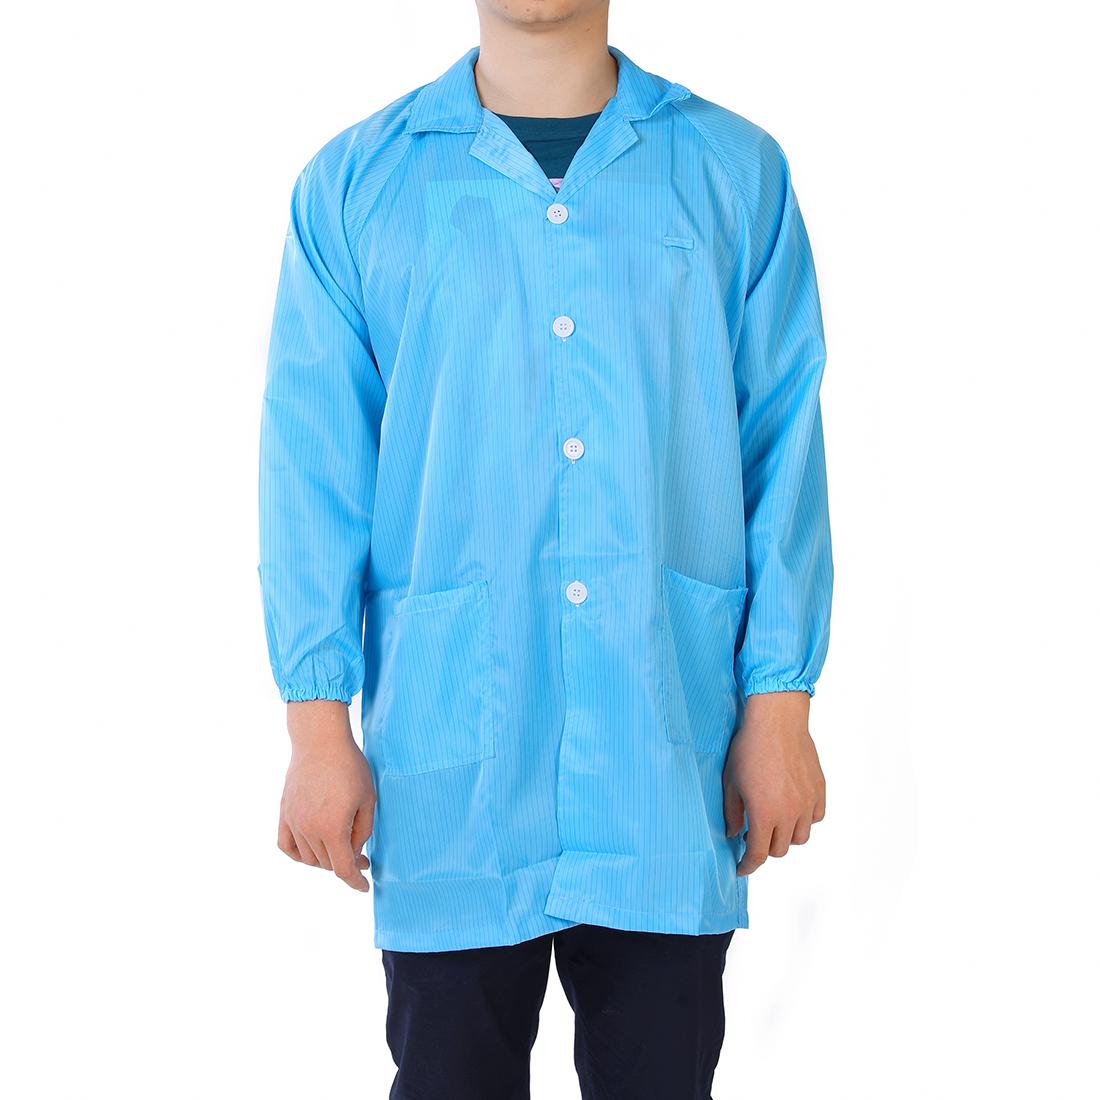 Anti Static Overalls Unisex ESD Lab Coat Button Up M Blue